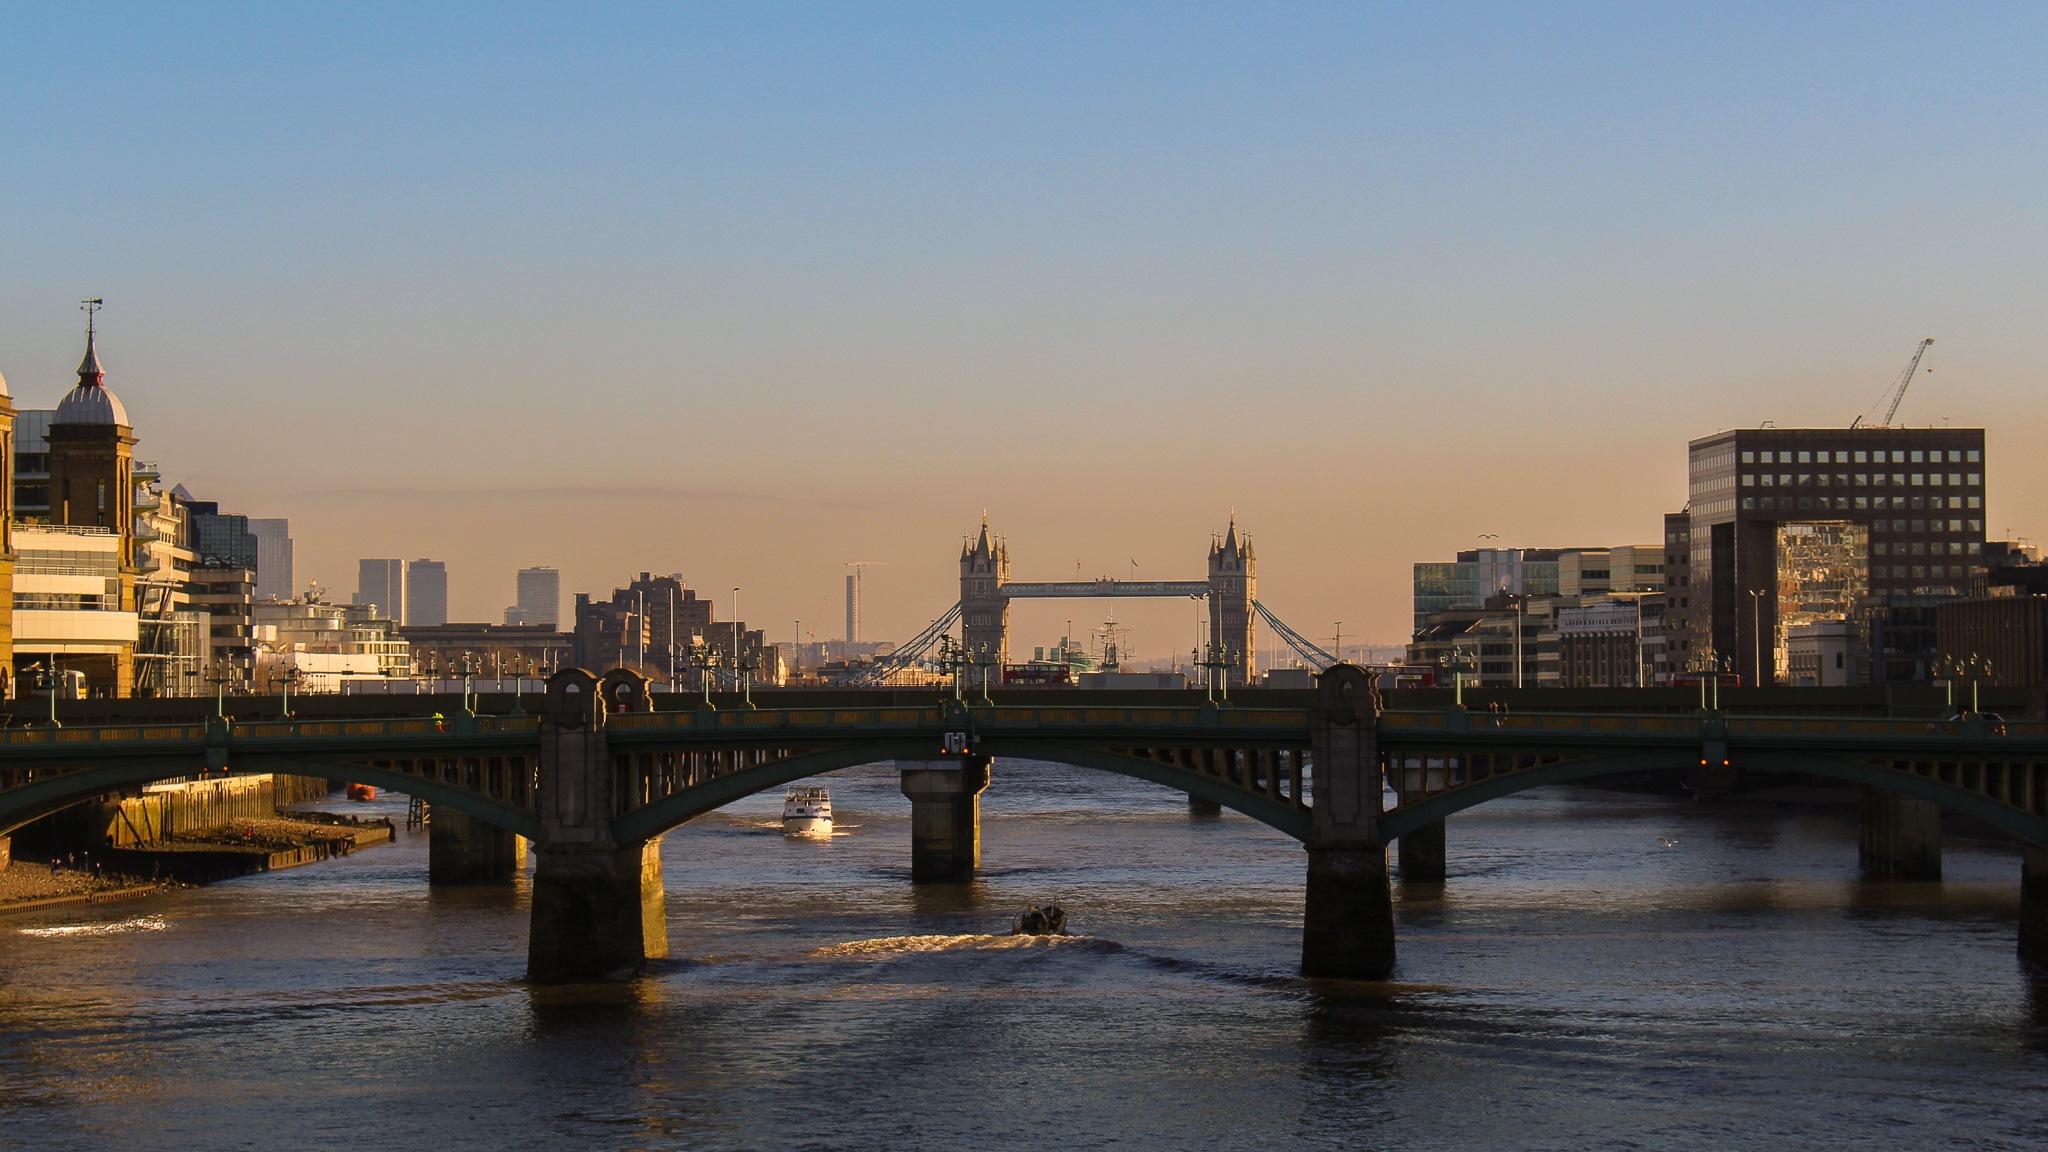 Sunset in London by Rafael Puerto